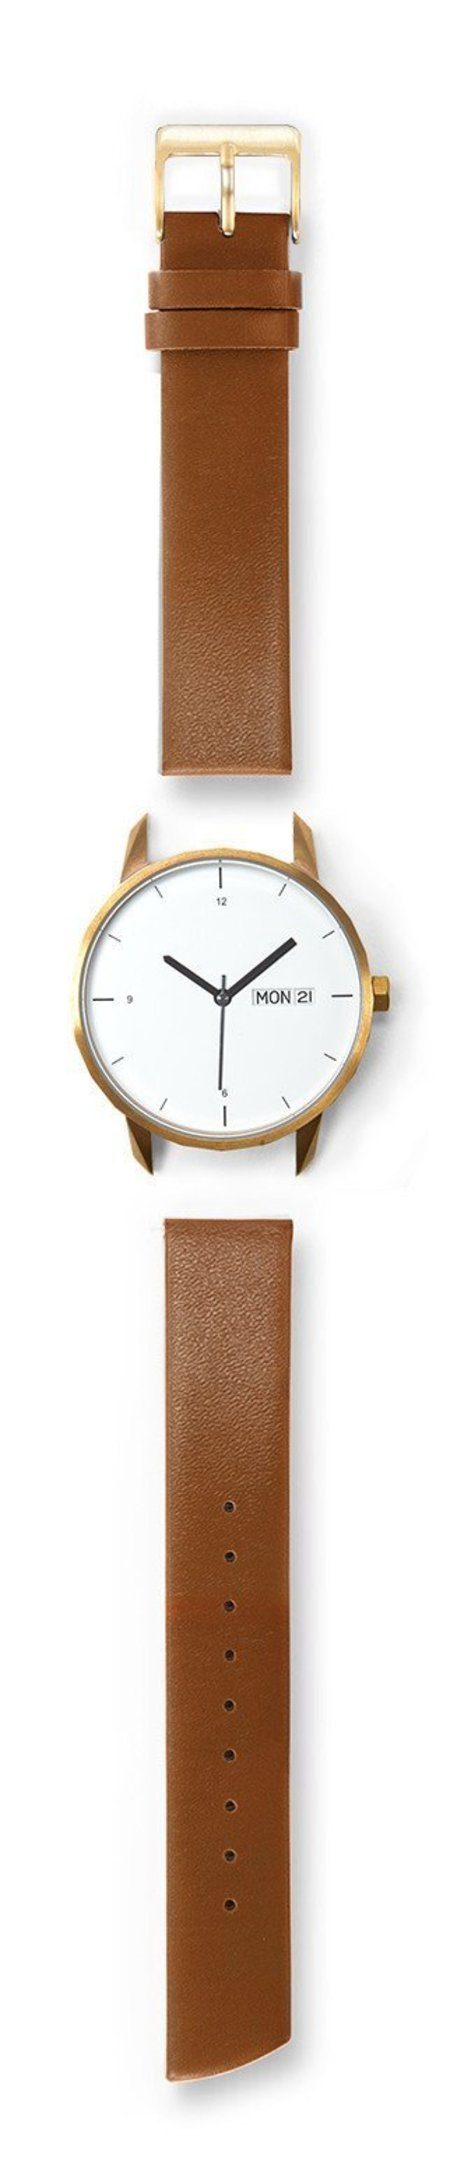 Unisex Tinker Watches Standard Strap Watch - Gold/Camel